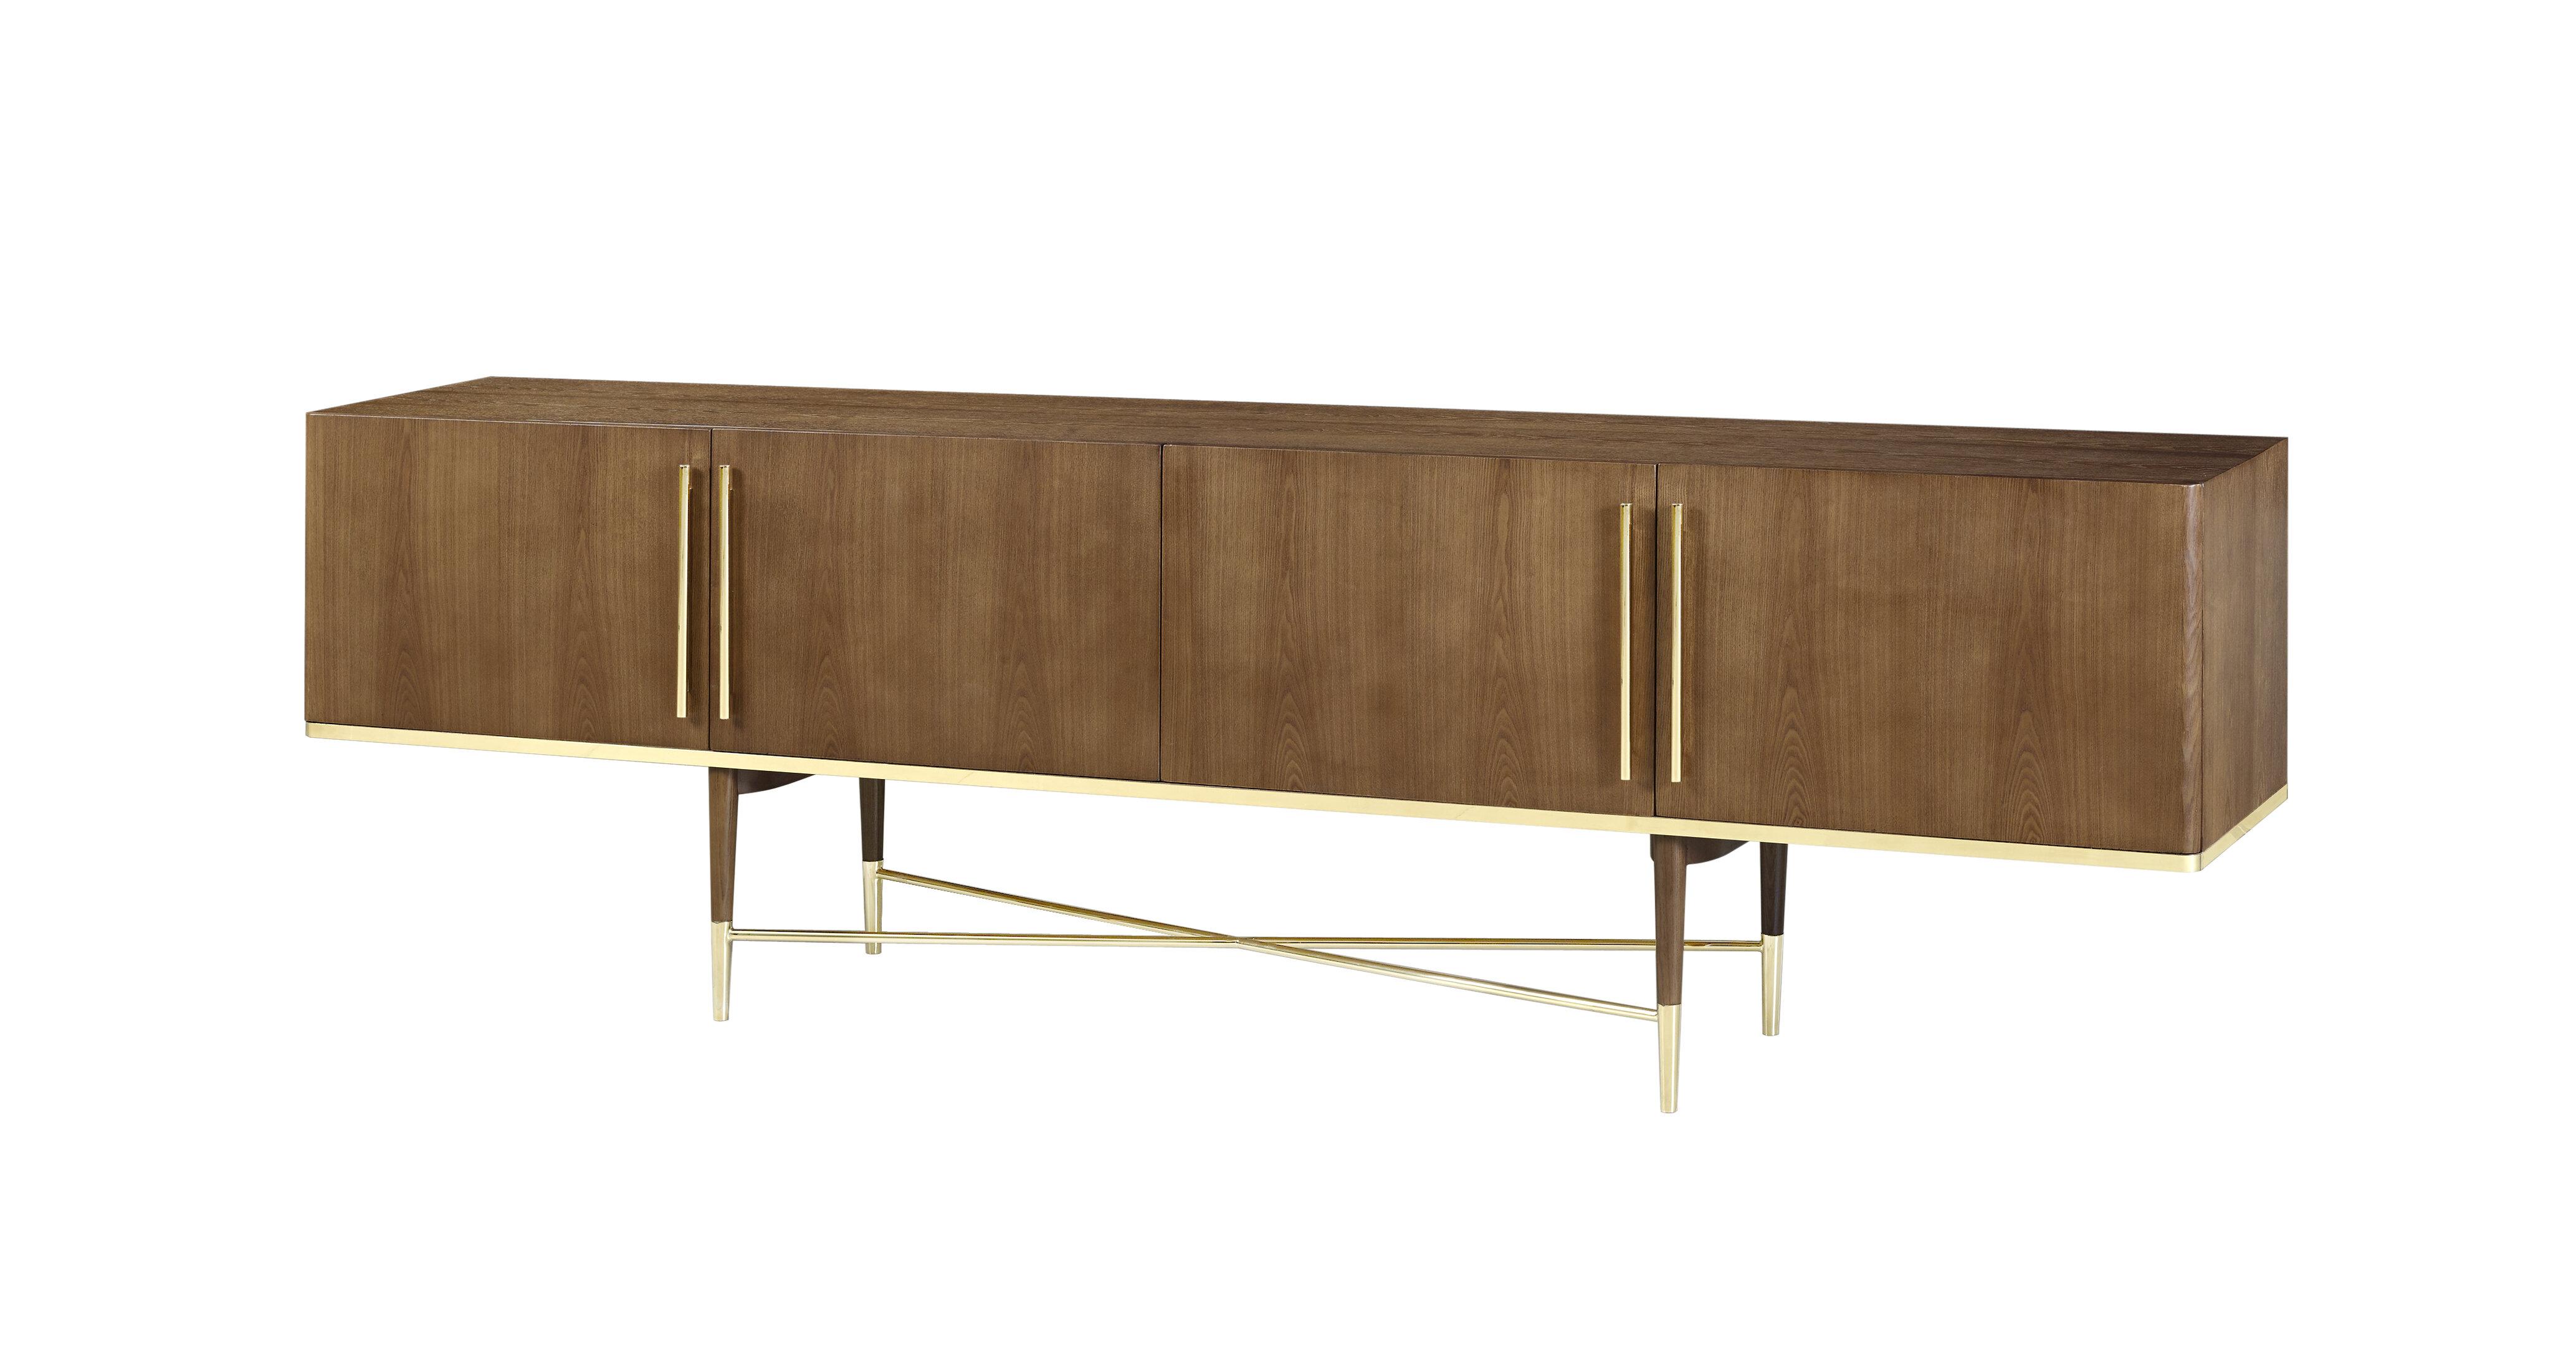 Everly Quinn Ivanhoe Mid Century Modern Sideboard